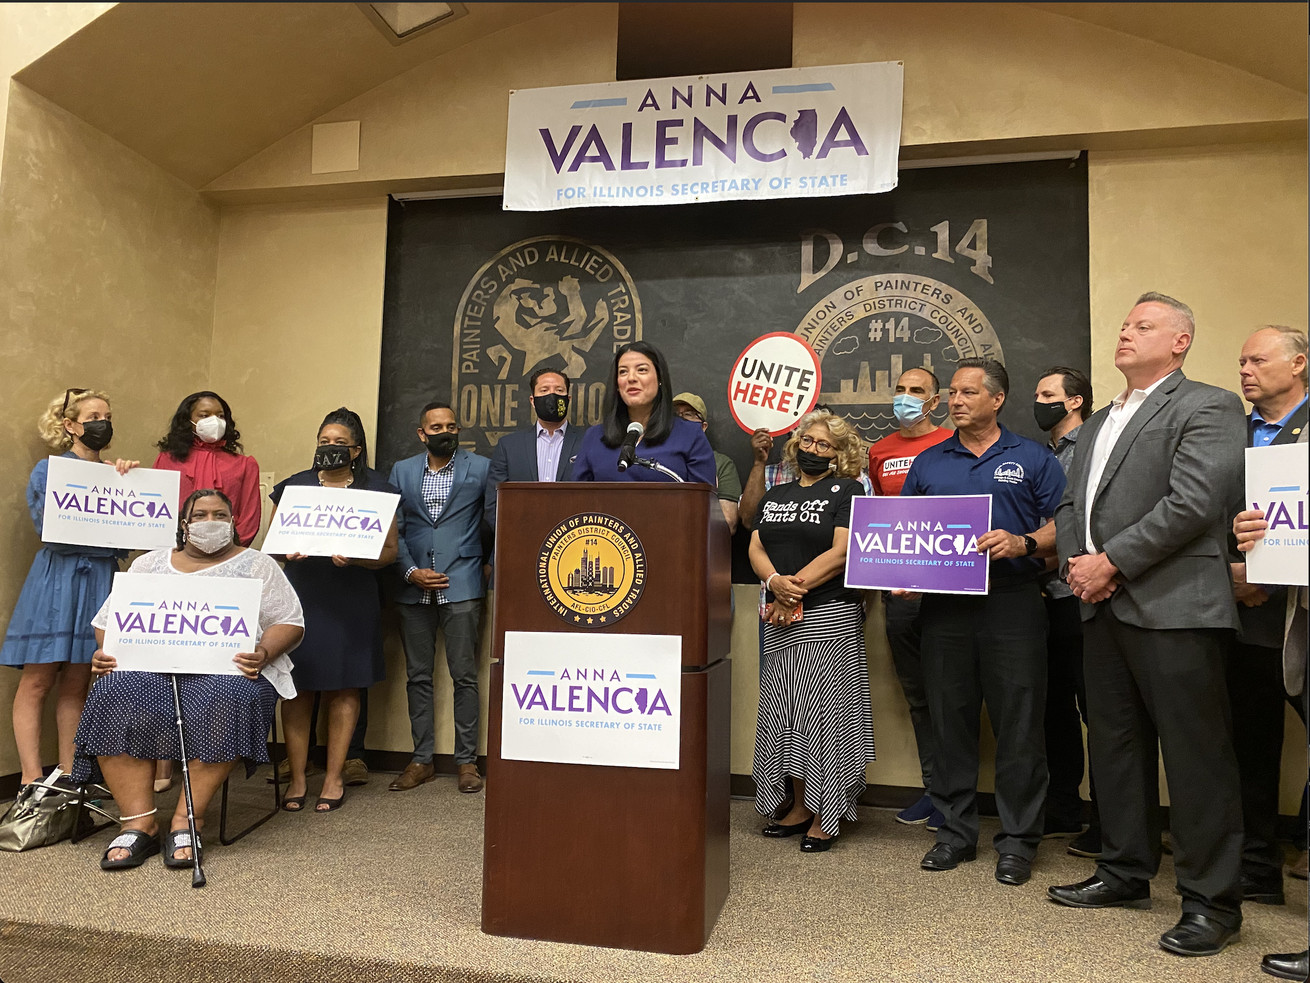 Chicago City Clerk Anna Valencia announces her run for Illinois secretary of state Monday.